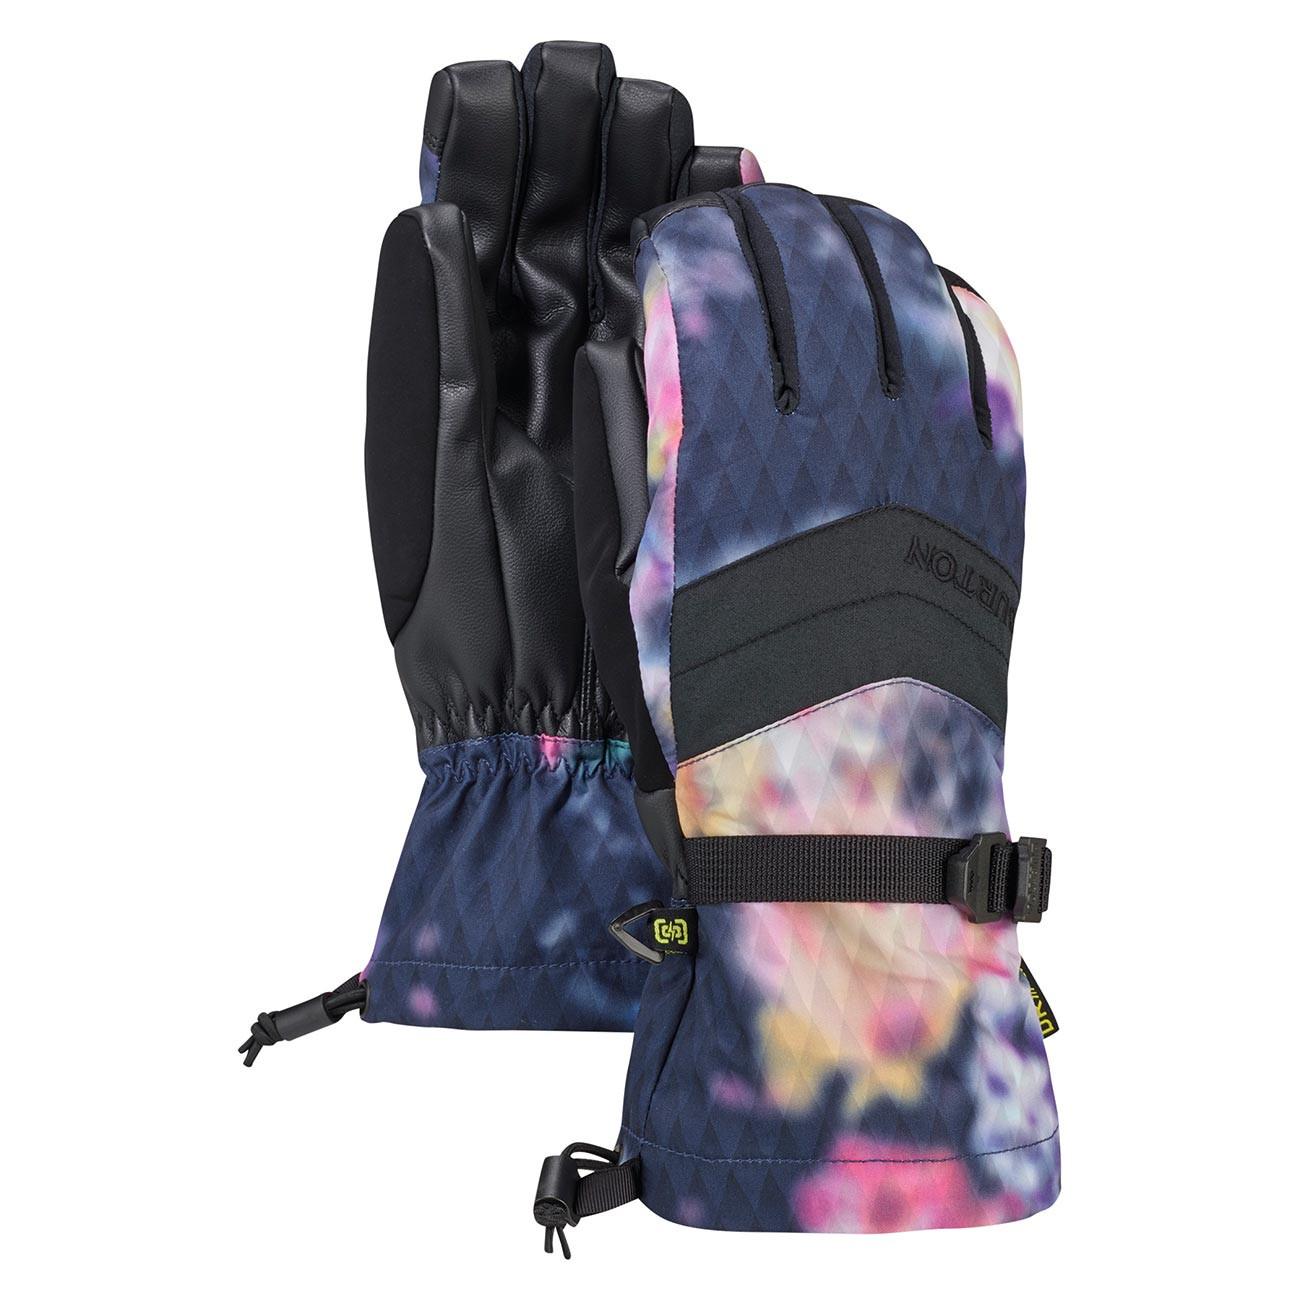 Rukavice Burton Wms Prospect prism floral/true black